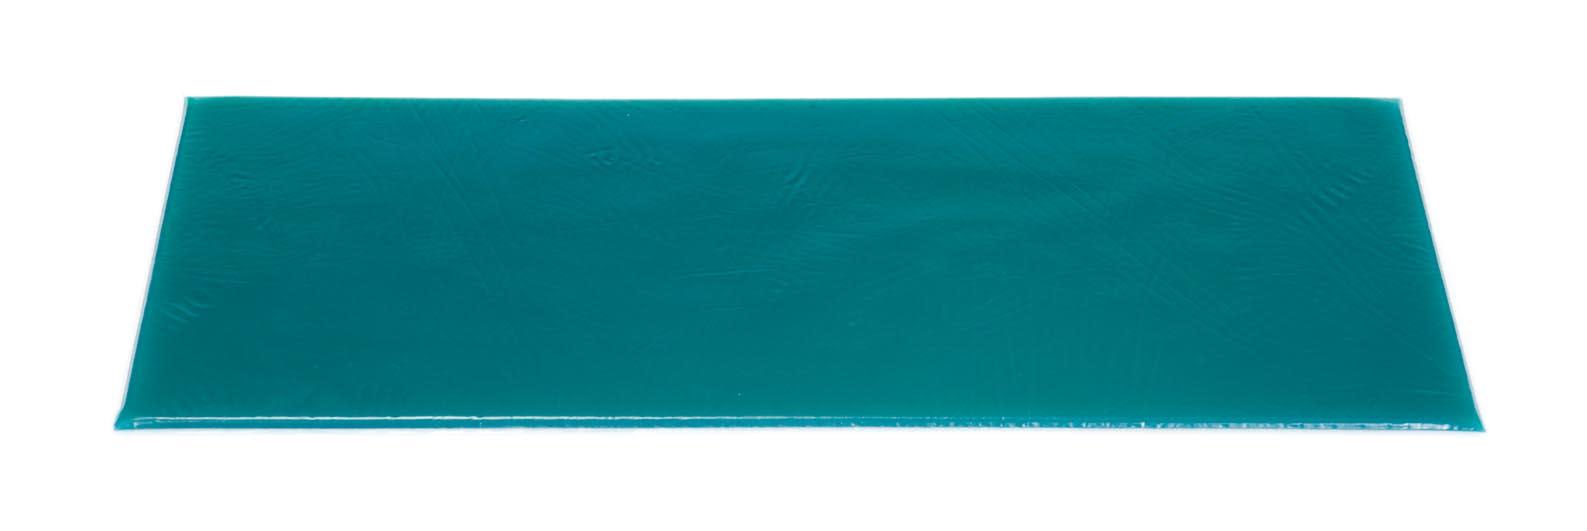 Oasis Paediatric Operating Table Pad (OA033) - Full Length - 605 x 335 x 10mm